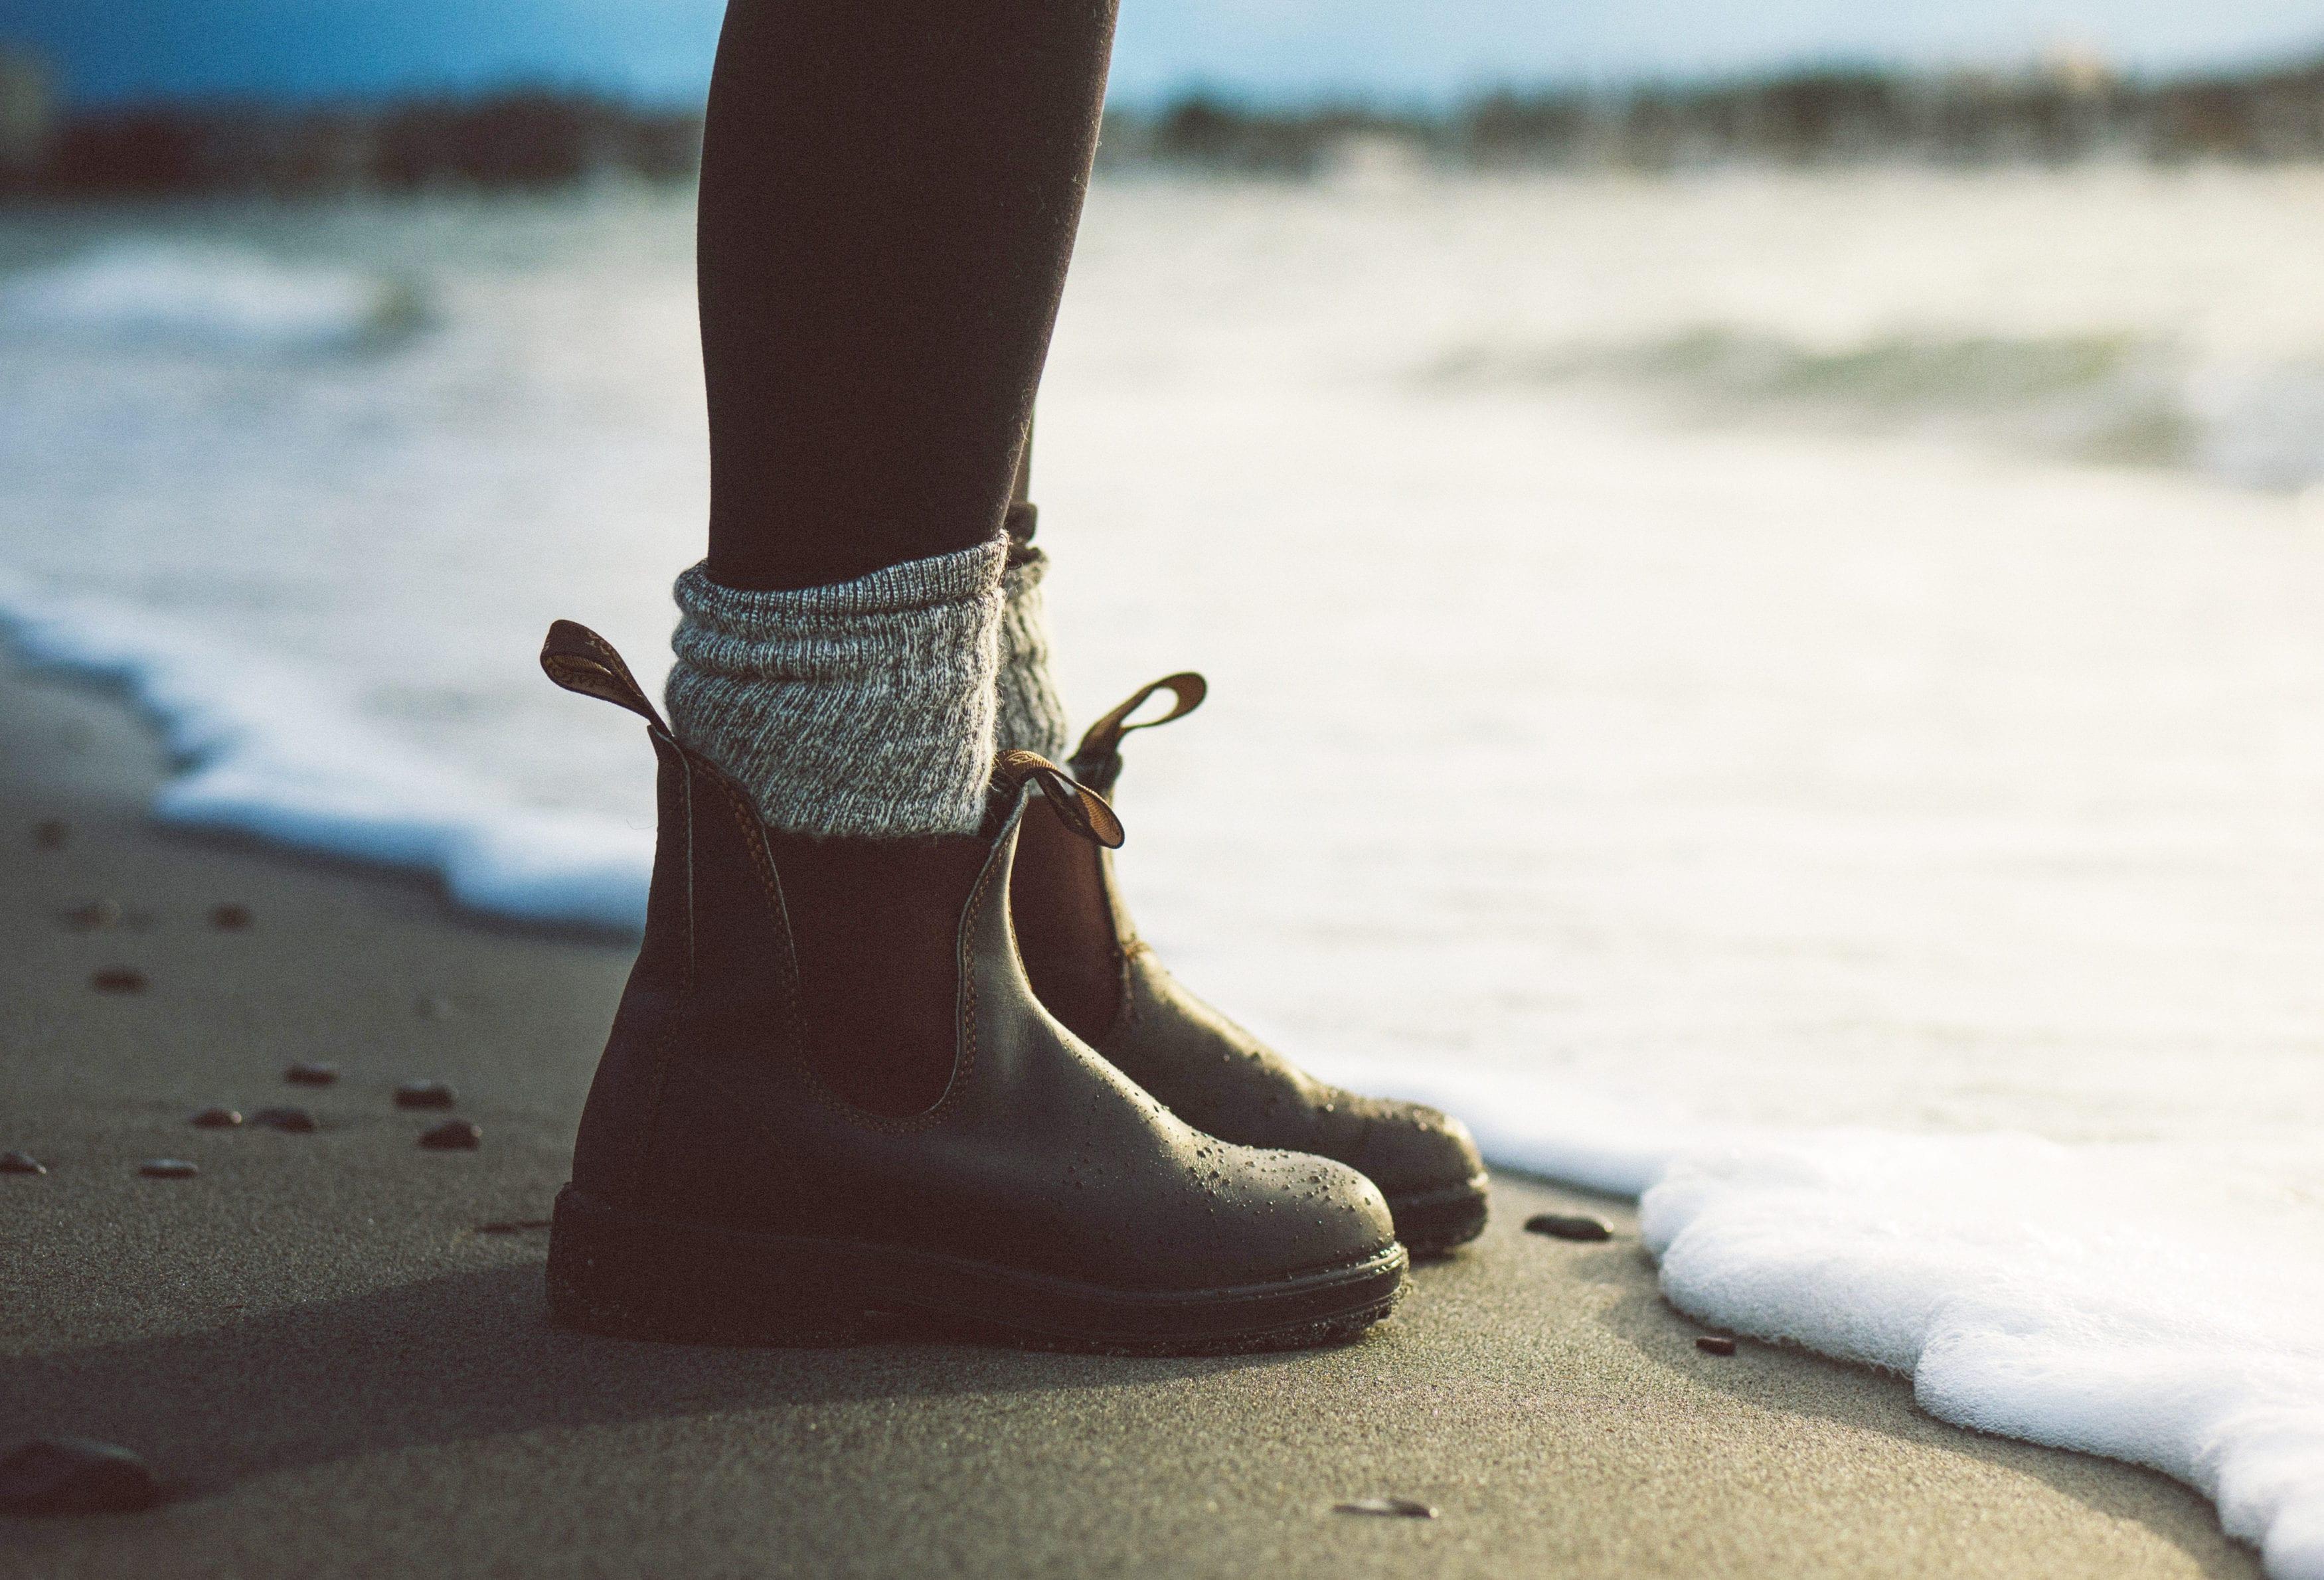 5d3083160e1 The Best Compression Socks for Air Travel - Tortuga Backpacks Blog